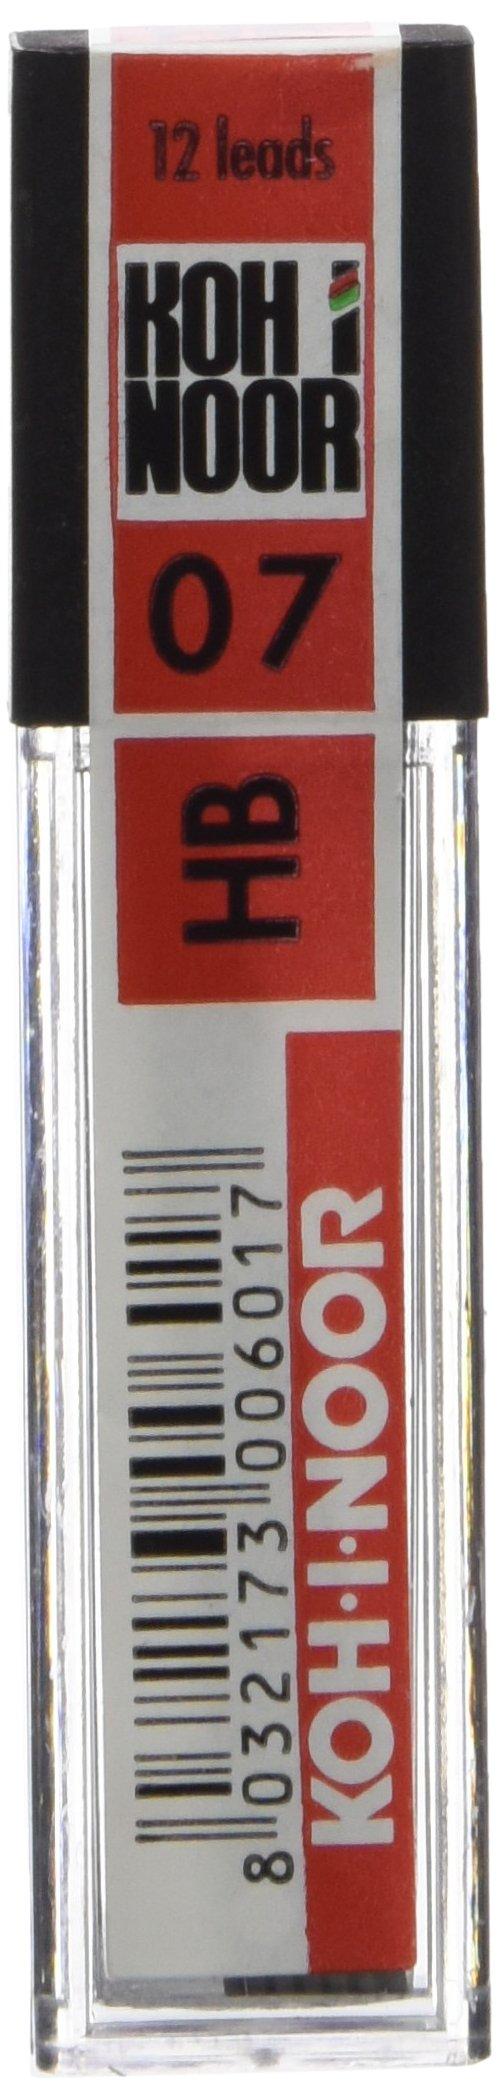 Astuccio 12 micromine 0,7mm HB e207 Kohinoor.